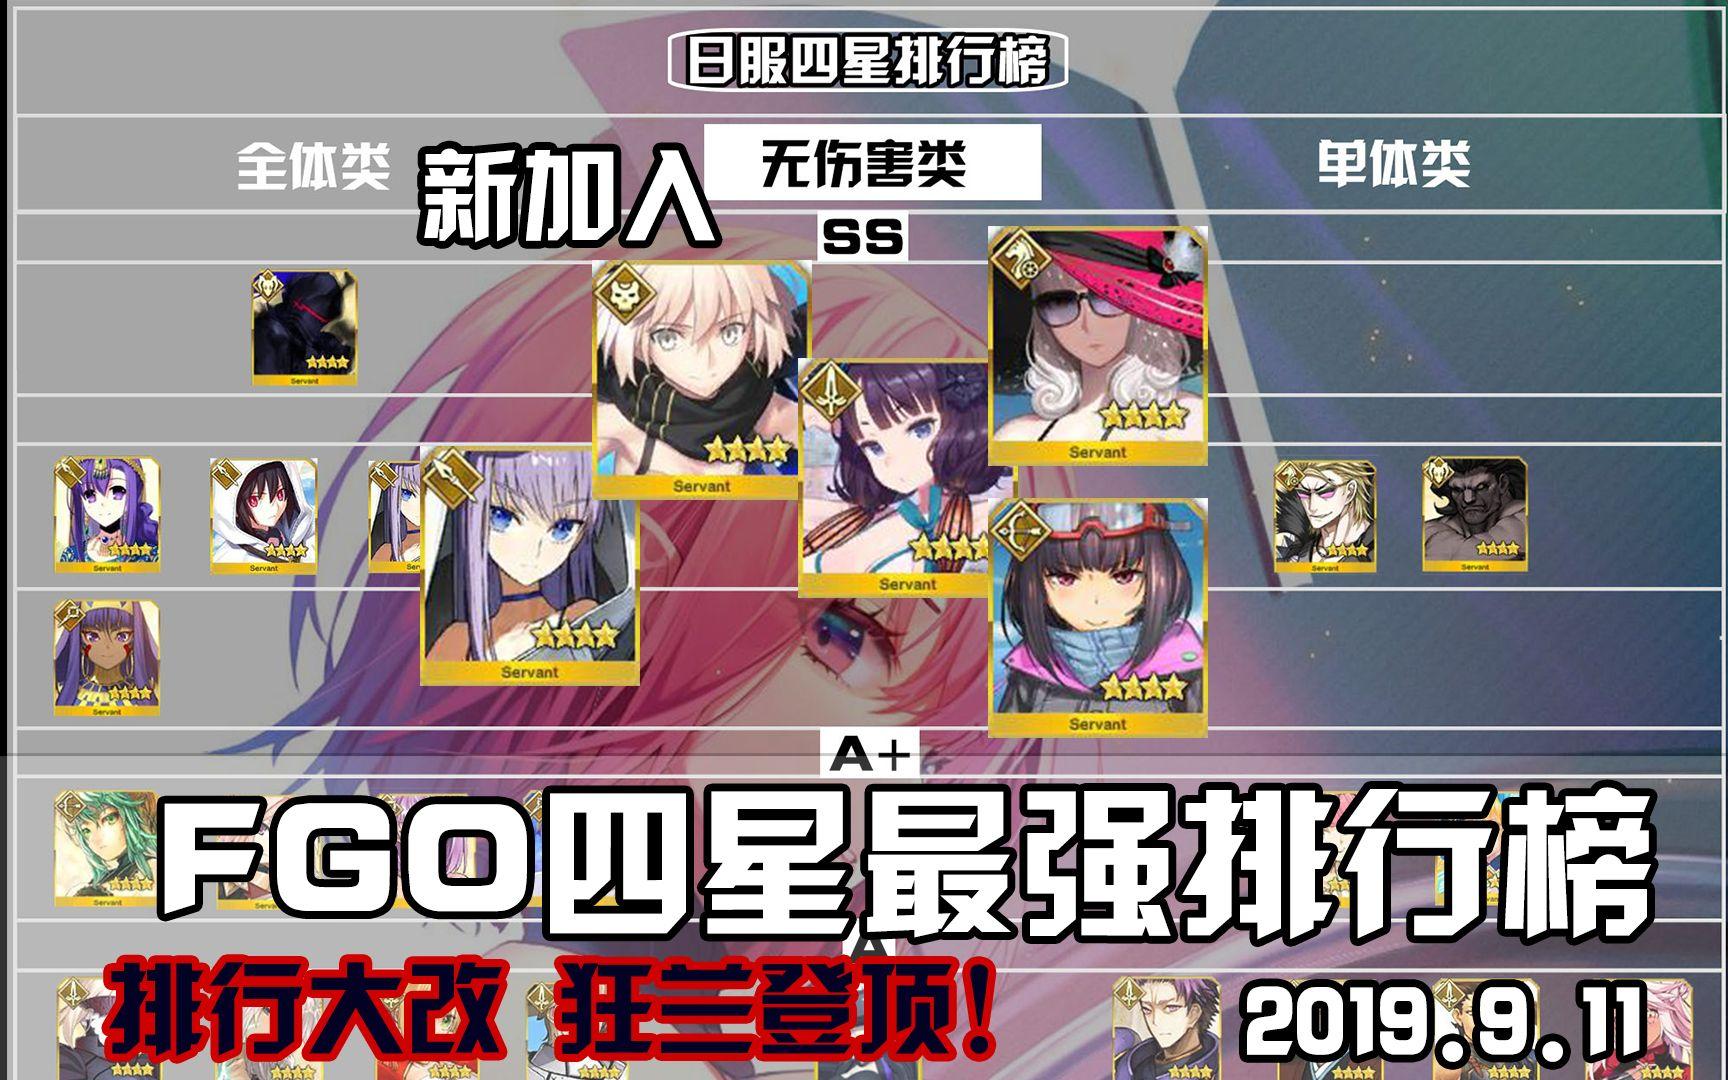 【FGO】四星最强排行榜 排行大变!狂兰登顶!(2019.9.11)